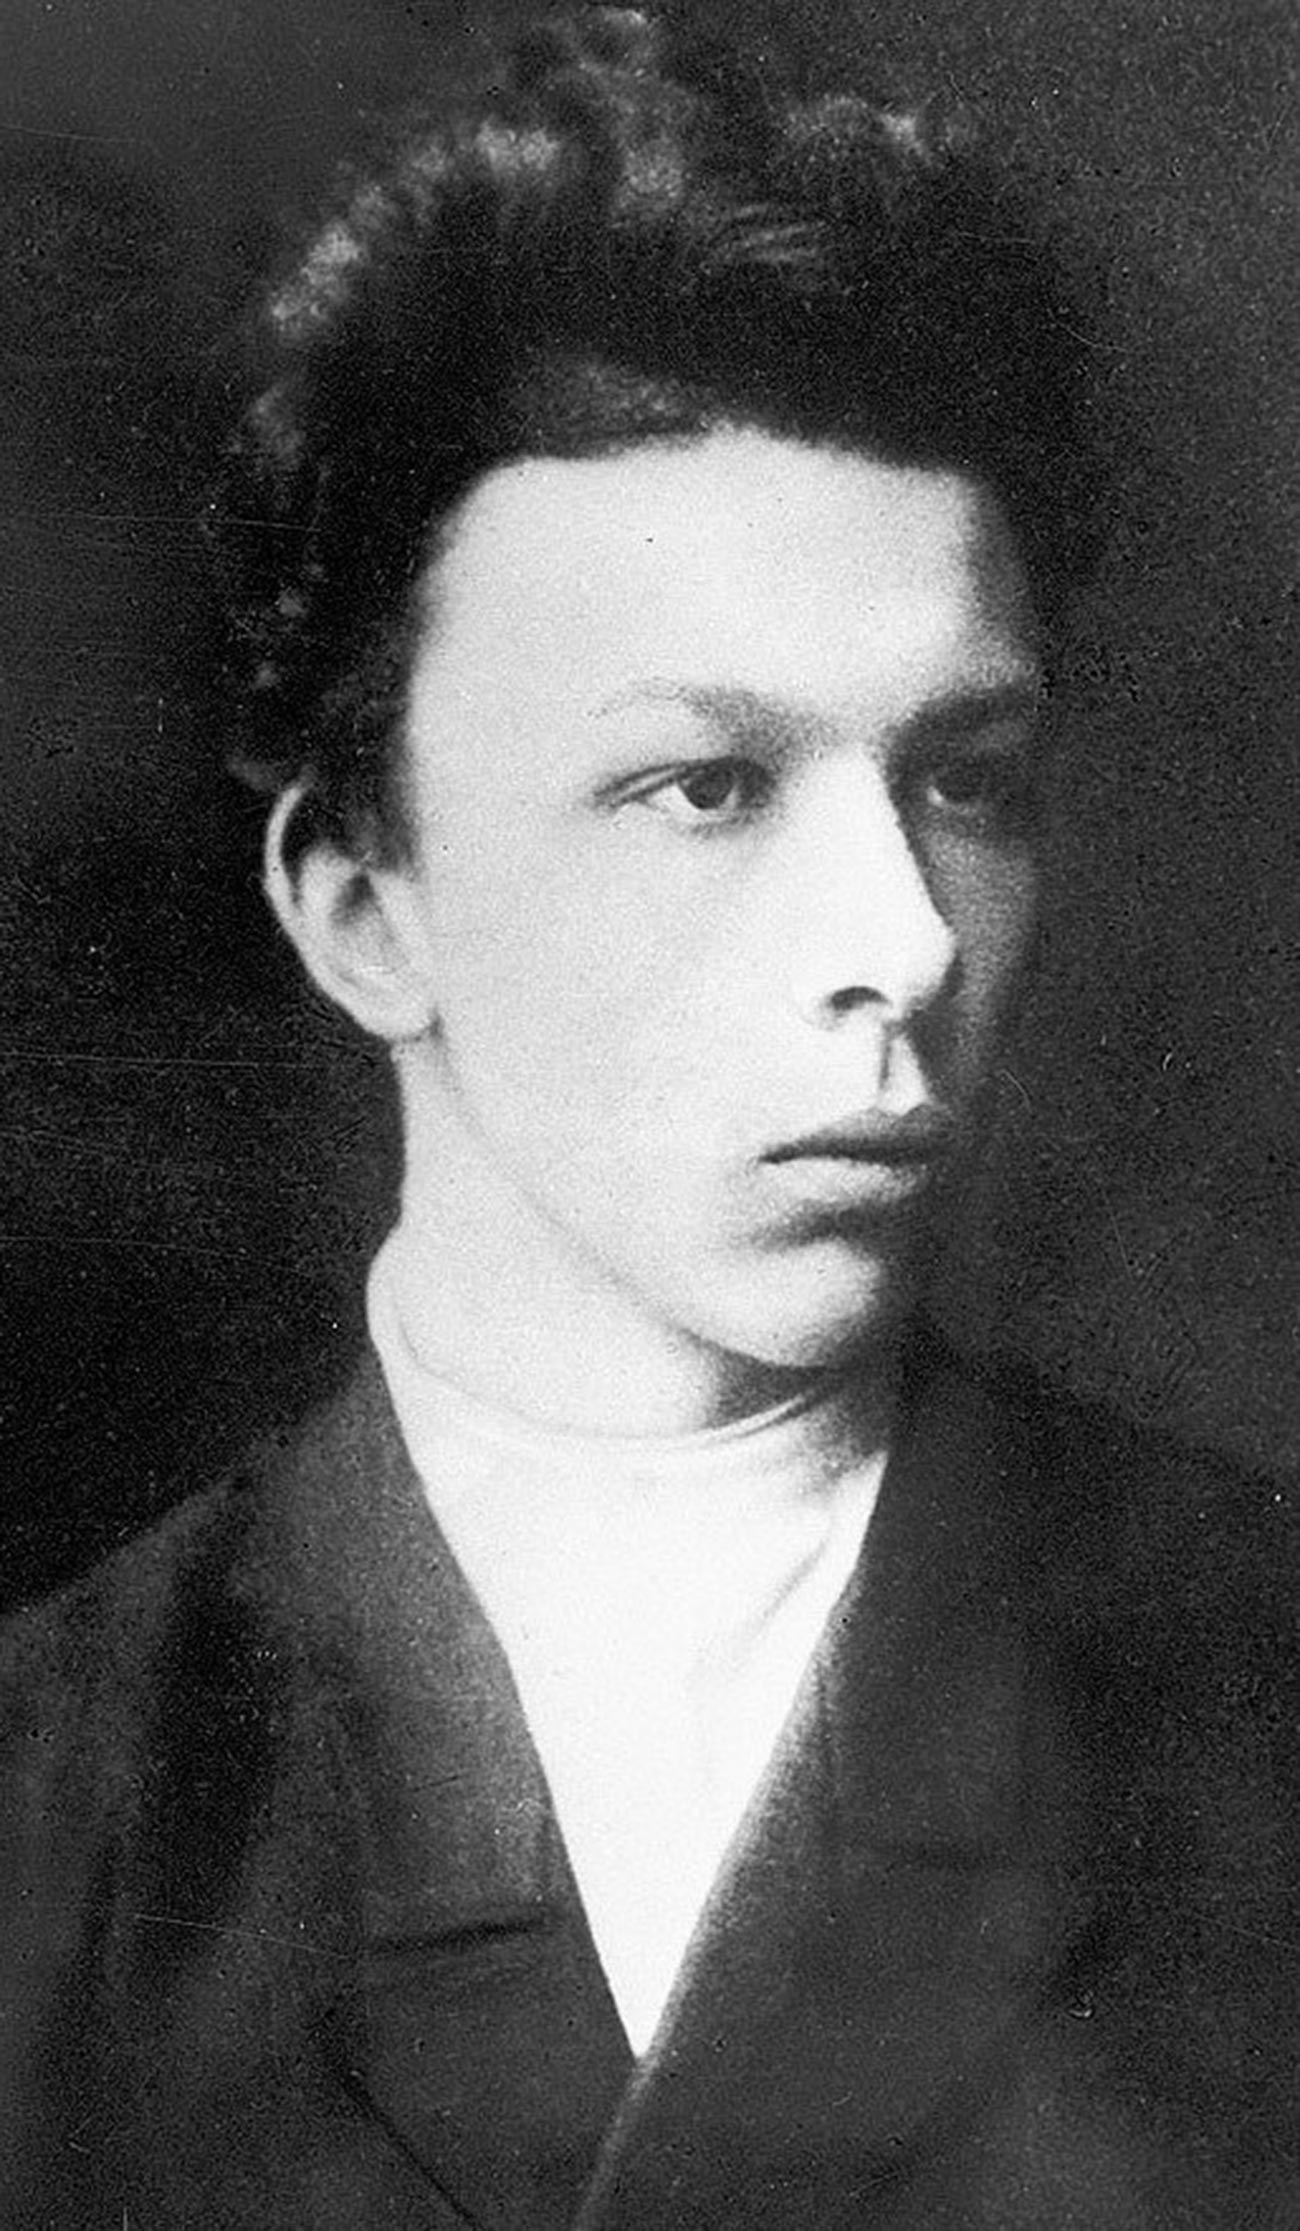 Aleksandr Uljanov (1866-1887), il fratello più grande di Vladimimr Lenin